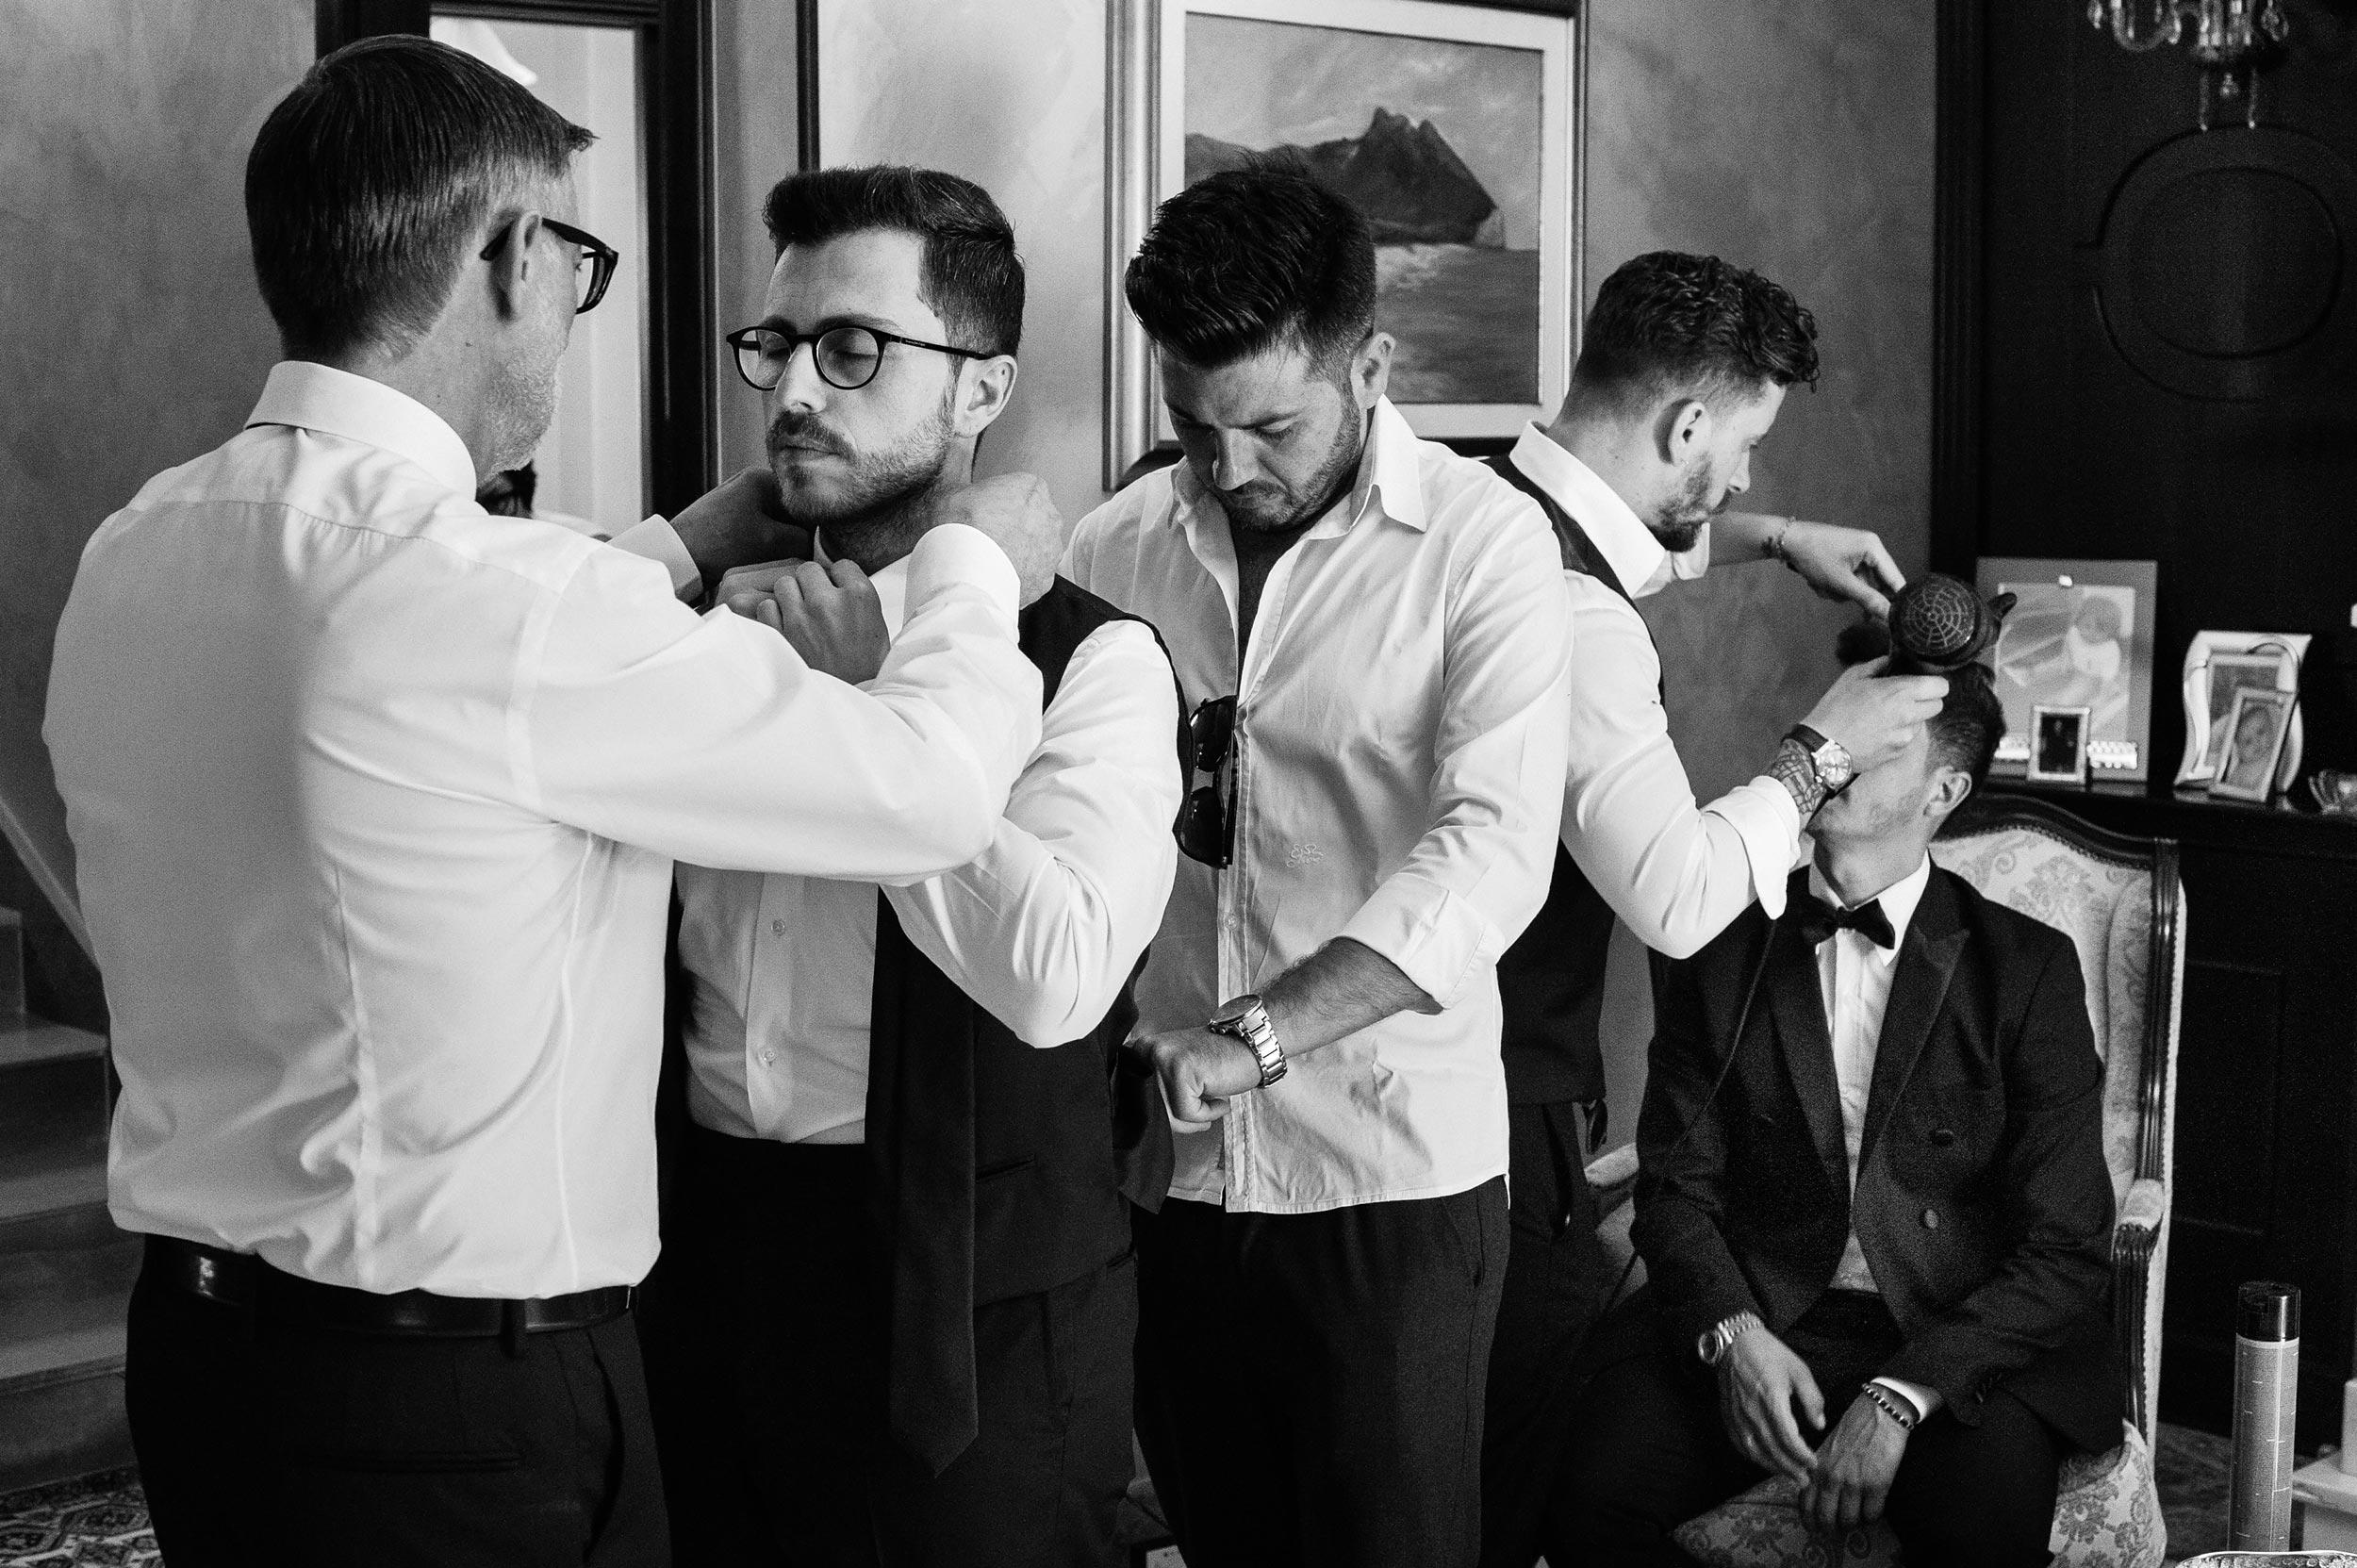 2016-Claudio-Teresa-Naples-Wedding-Photographer-Italy-Alessandro-Avenali-12.jpg